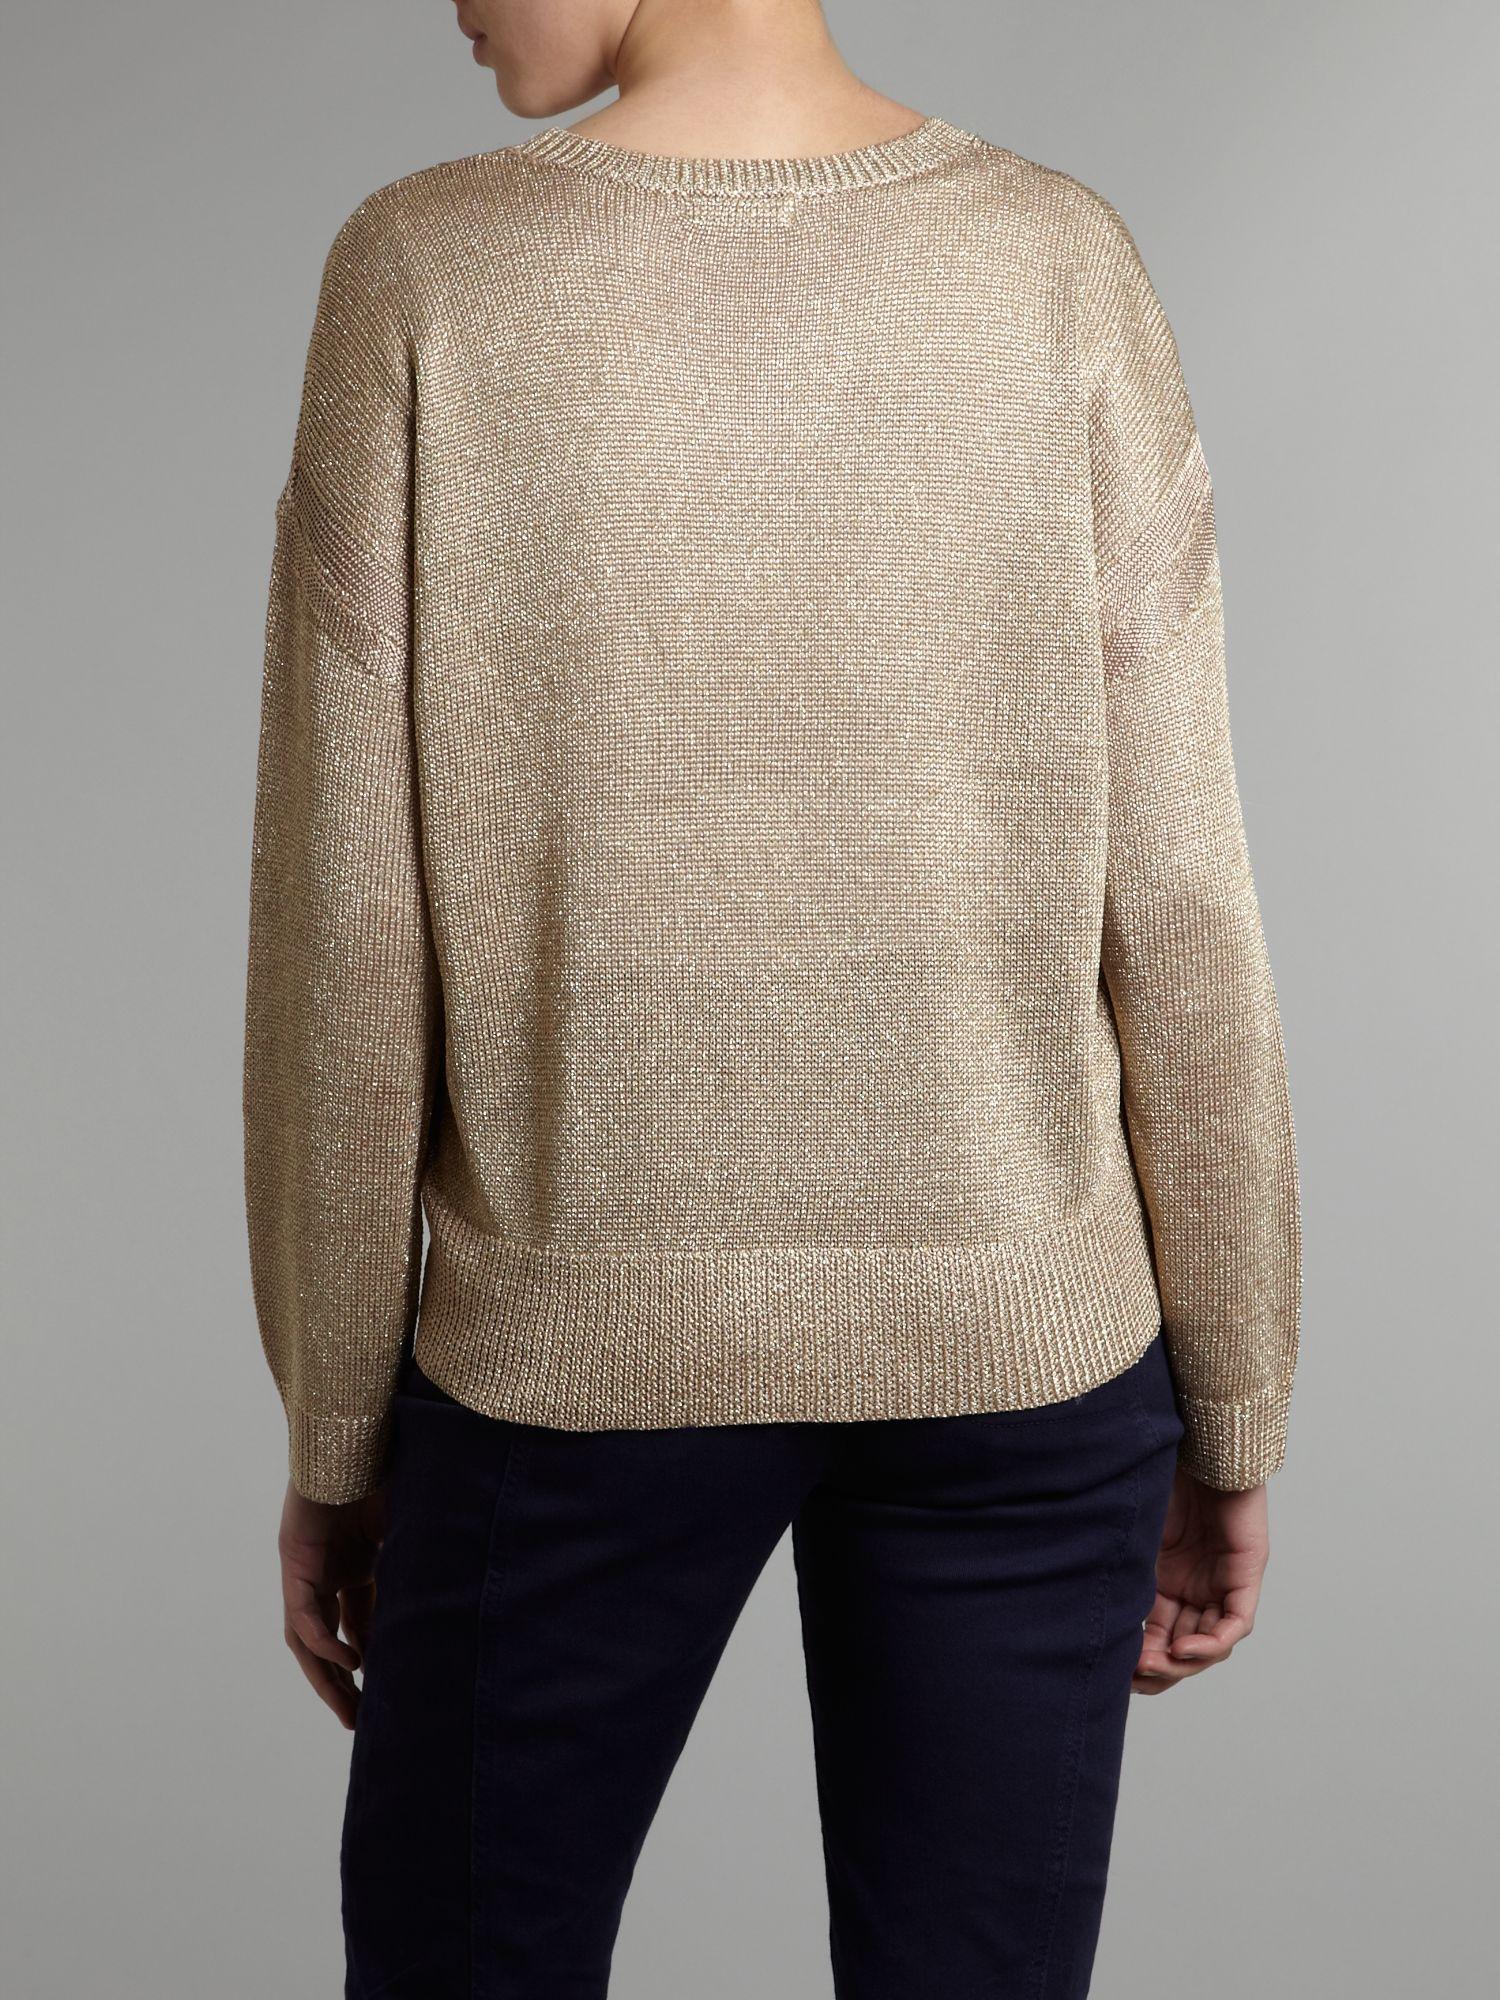 Striped Sleeve Sweater